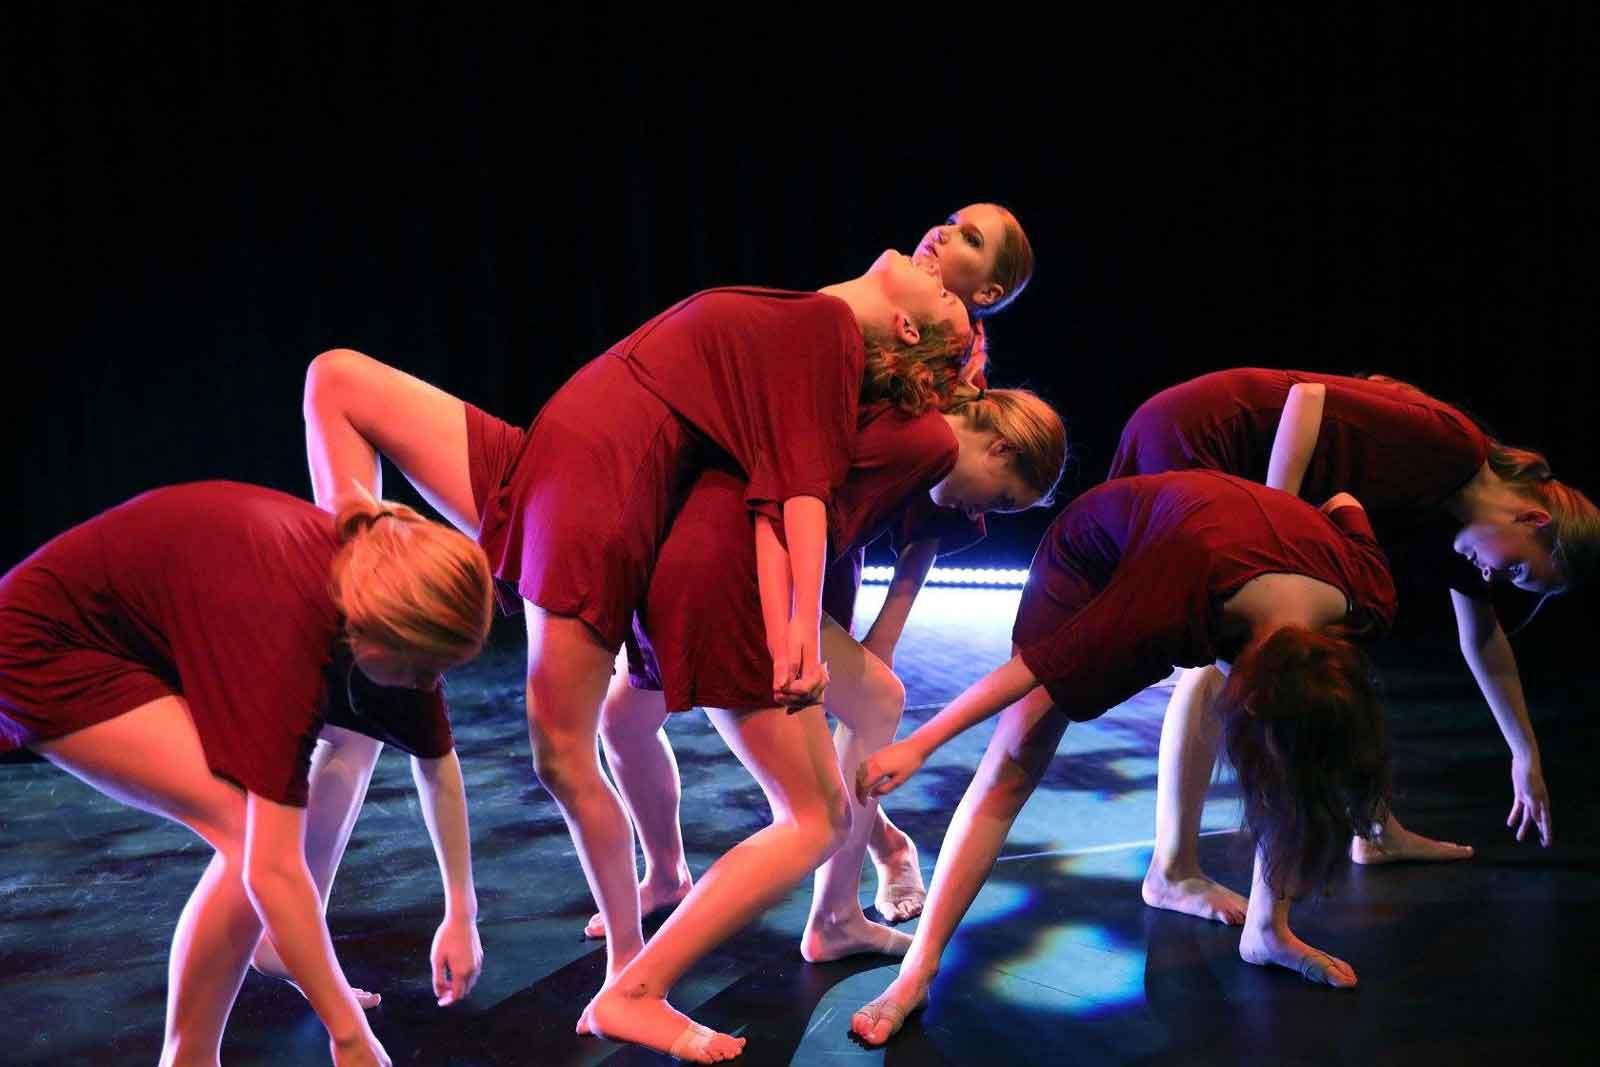 Dansoptreden Balletschool Margot Bierens